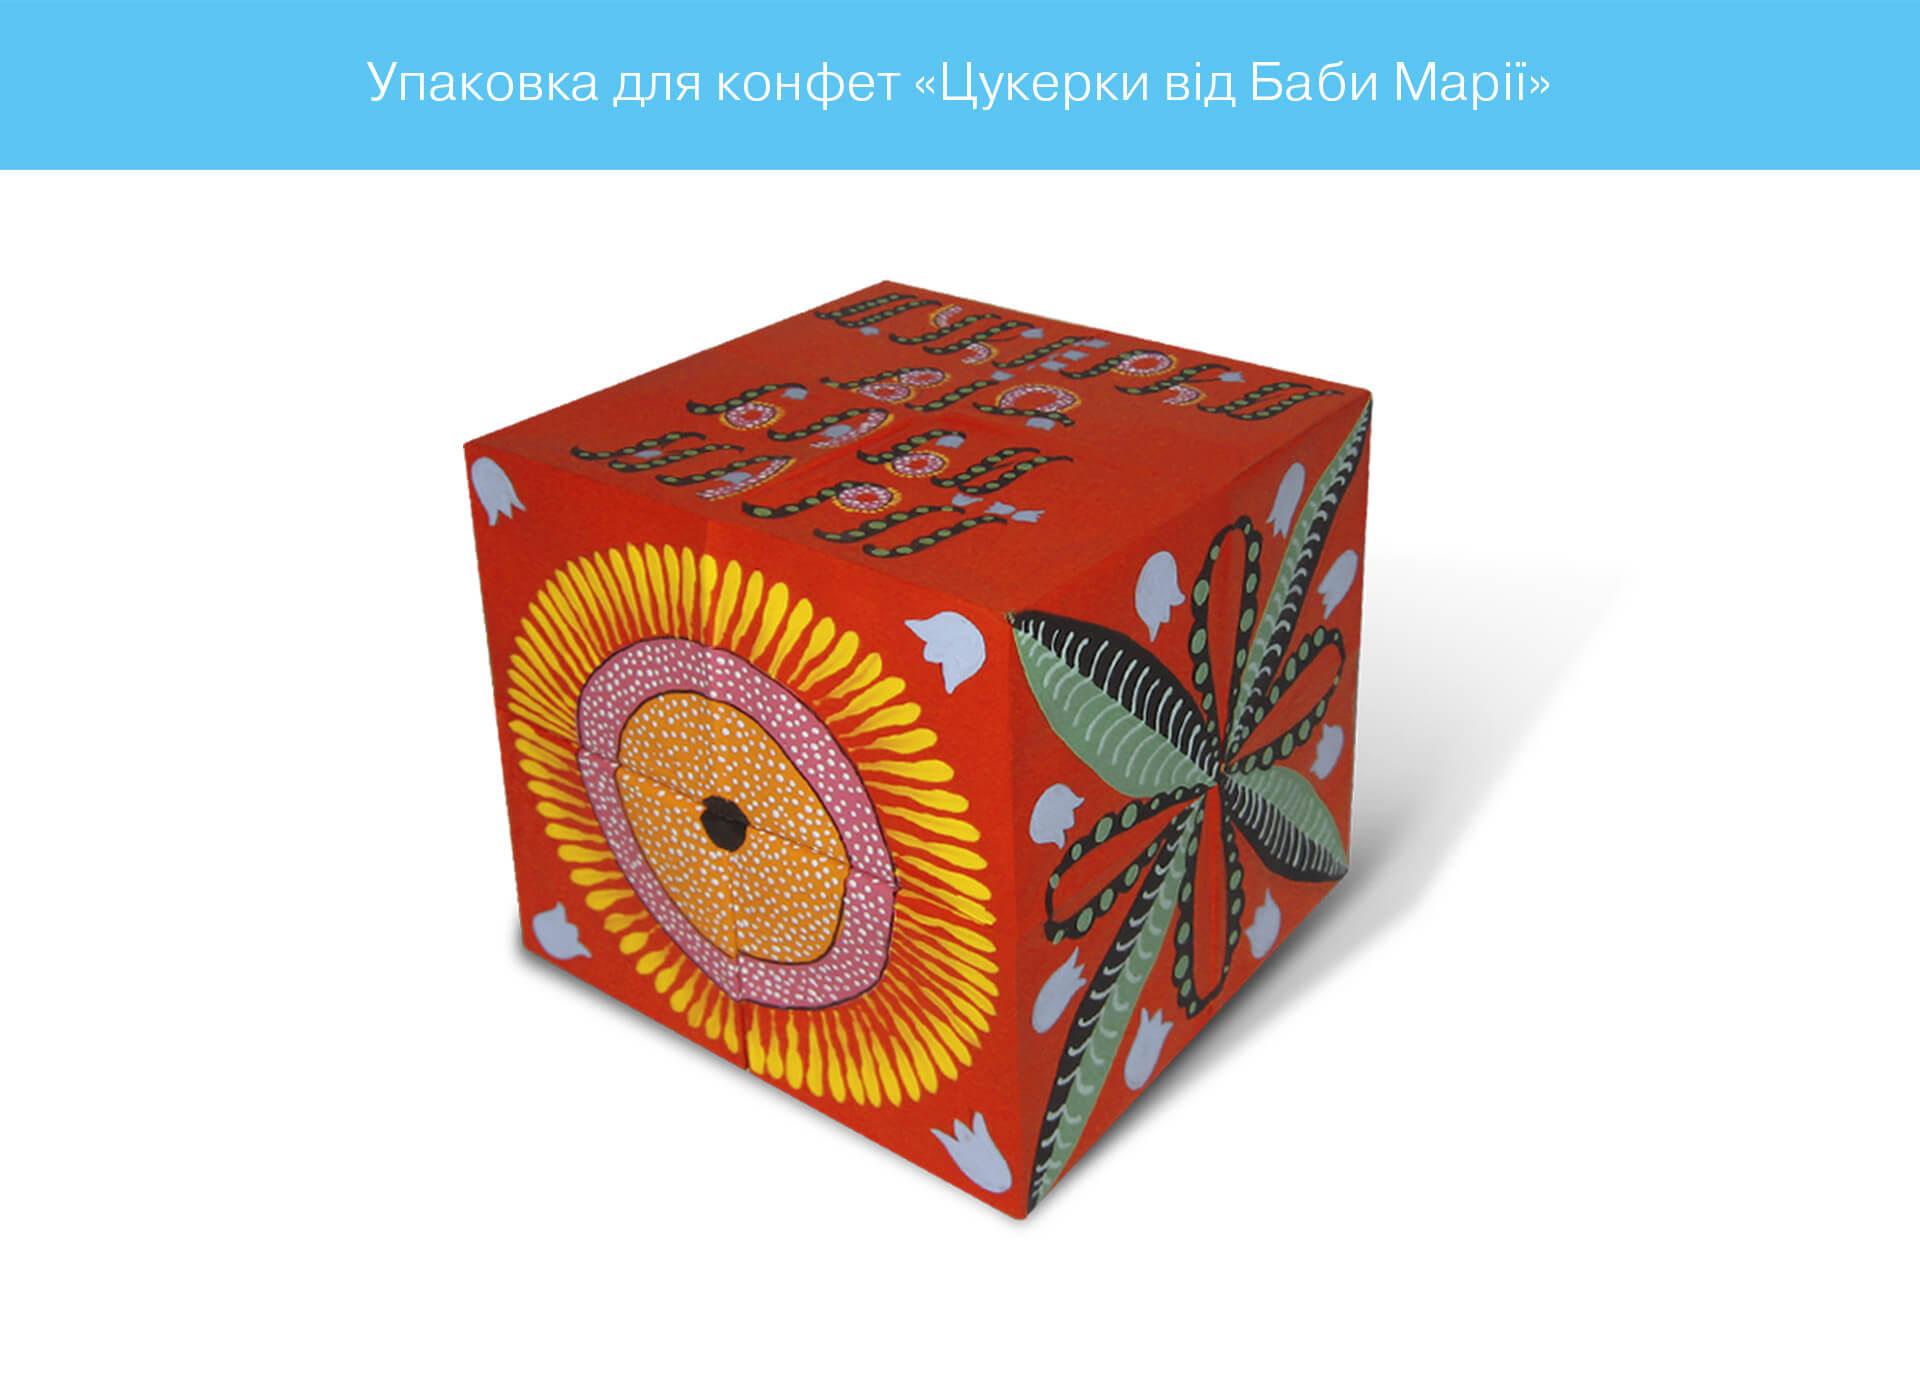 Prokochuk_Irina_Packing Tsukerki od Babi Marії_4